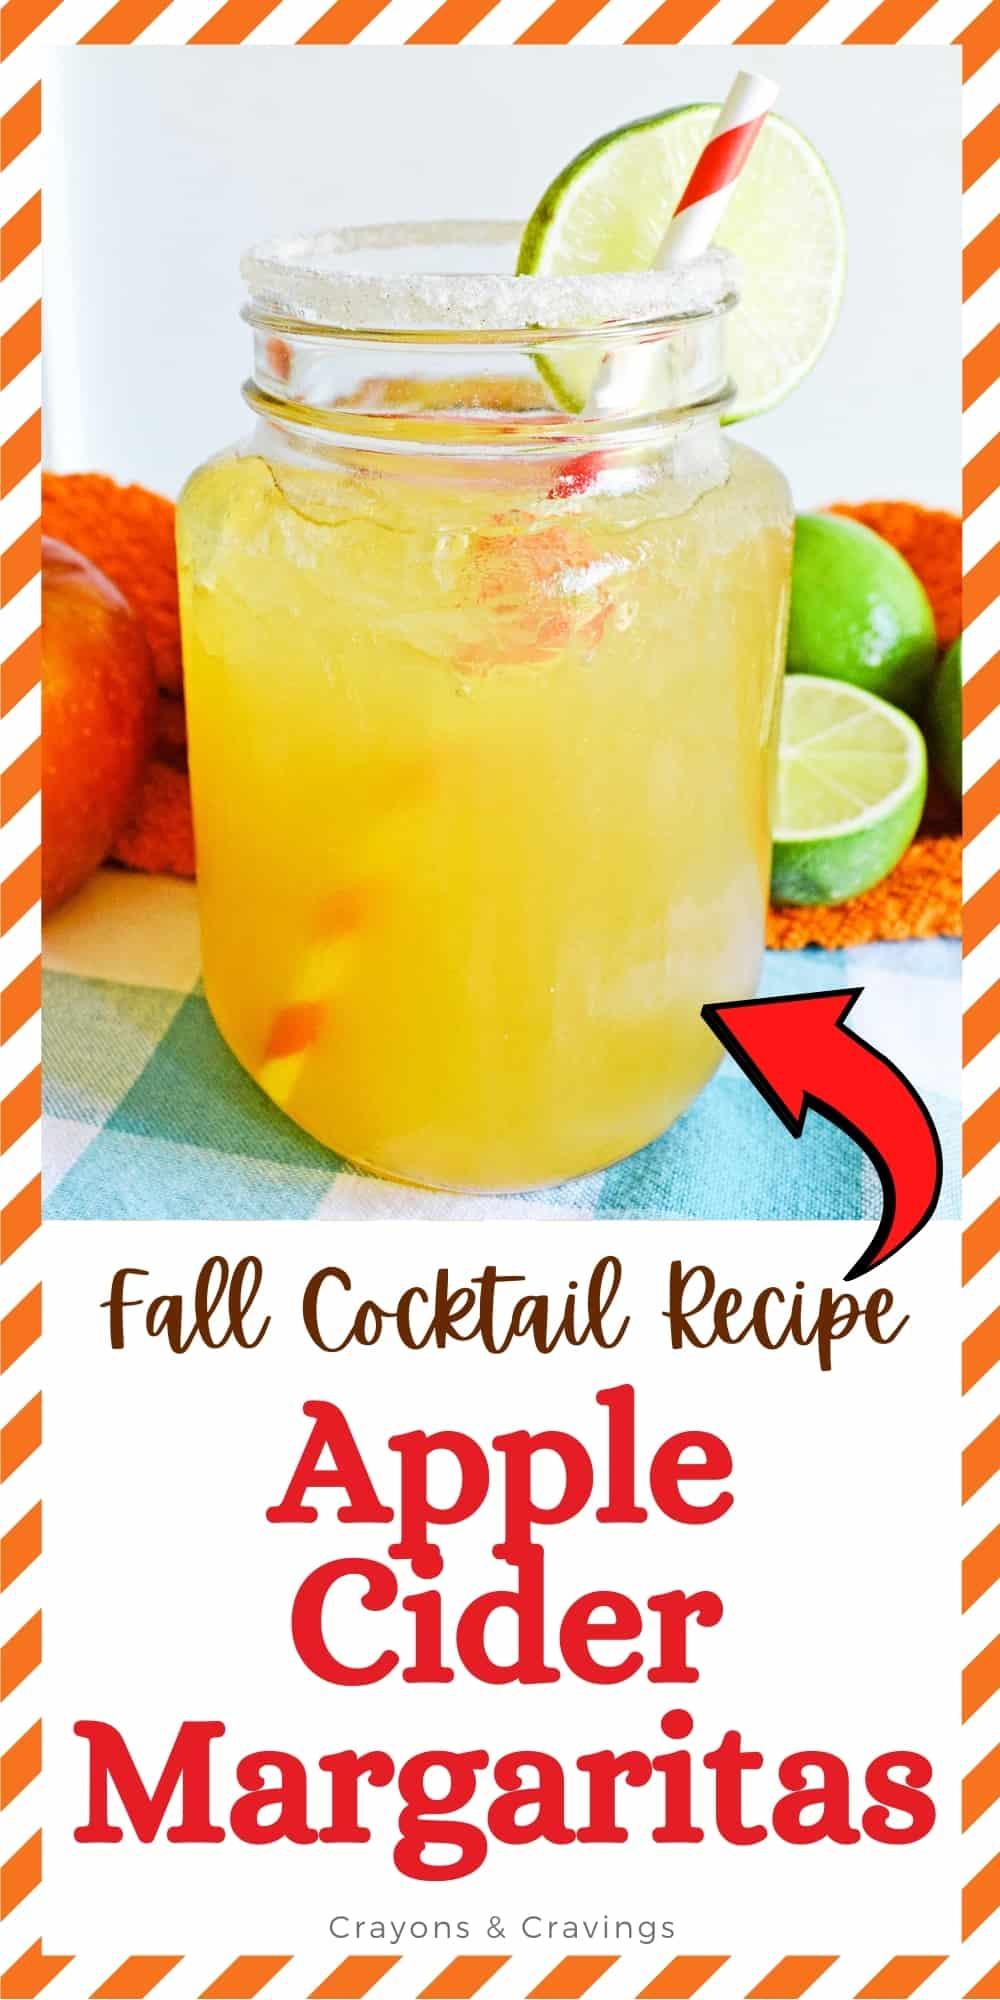 Fall Cocktail Recipe; Apple Cider Margaritas